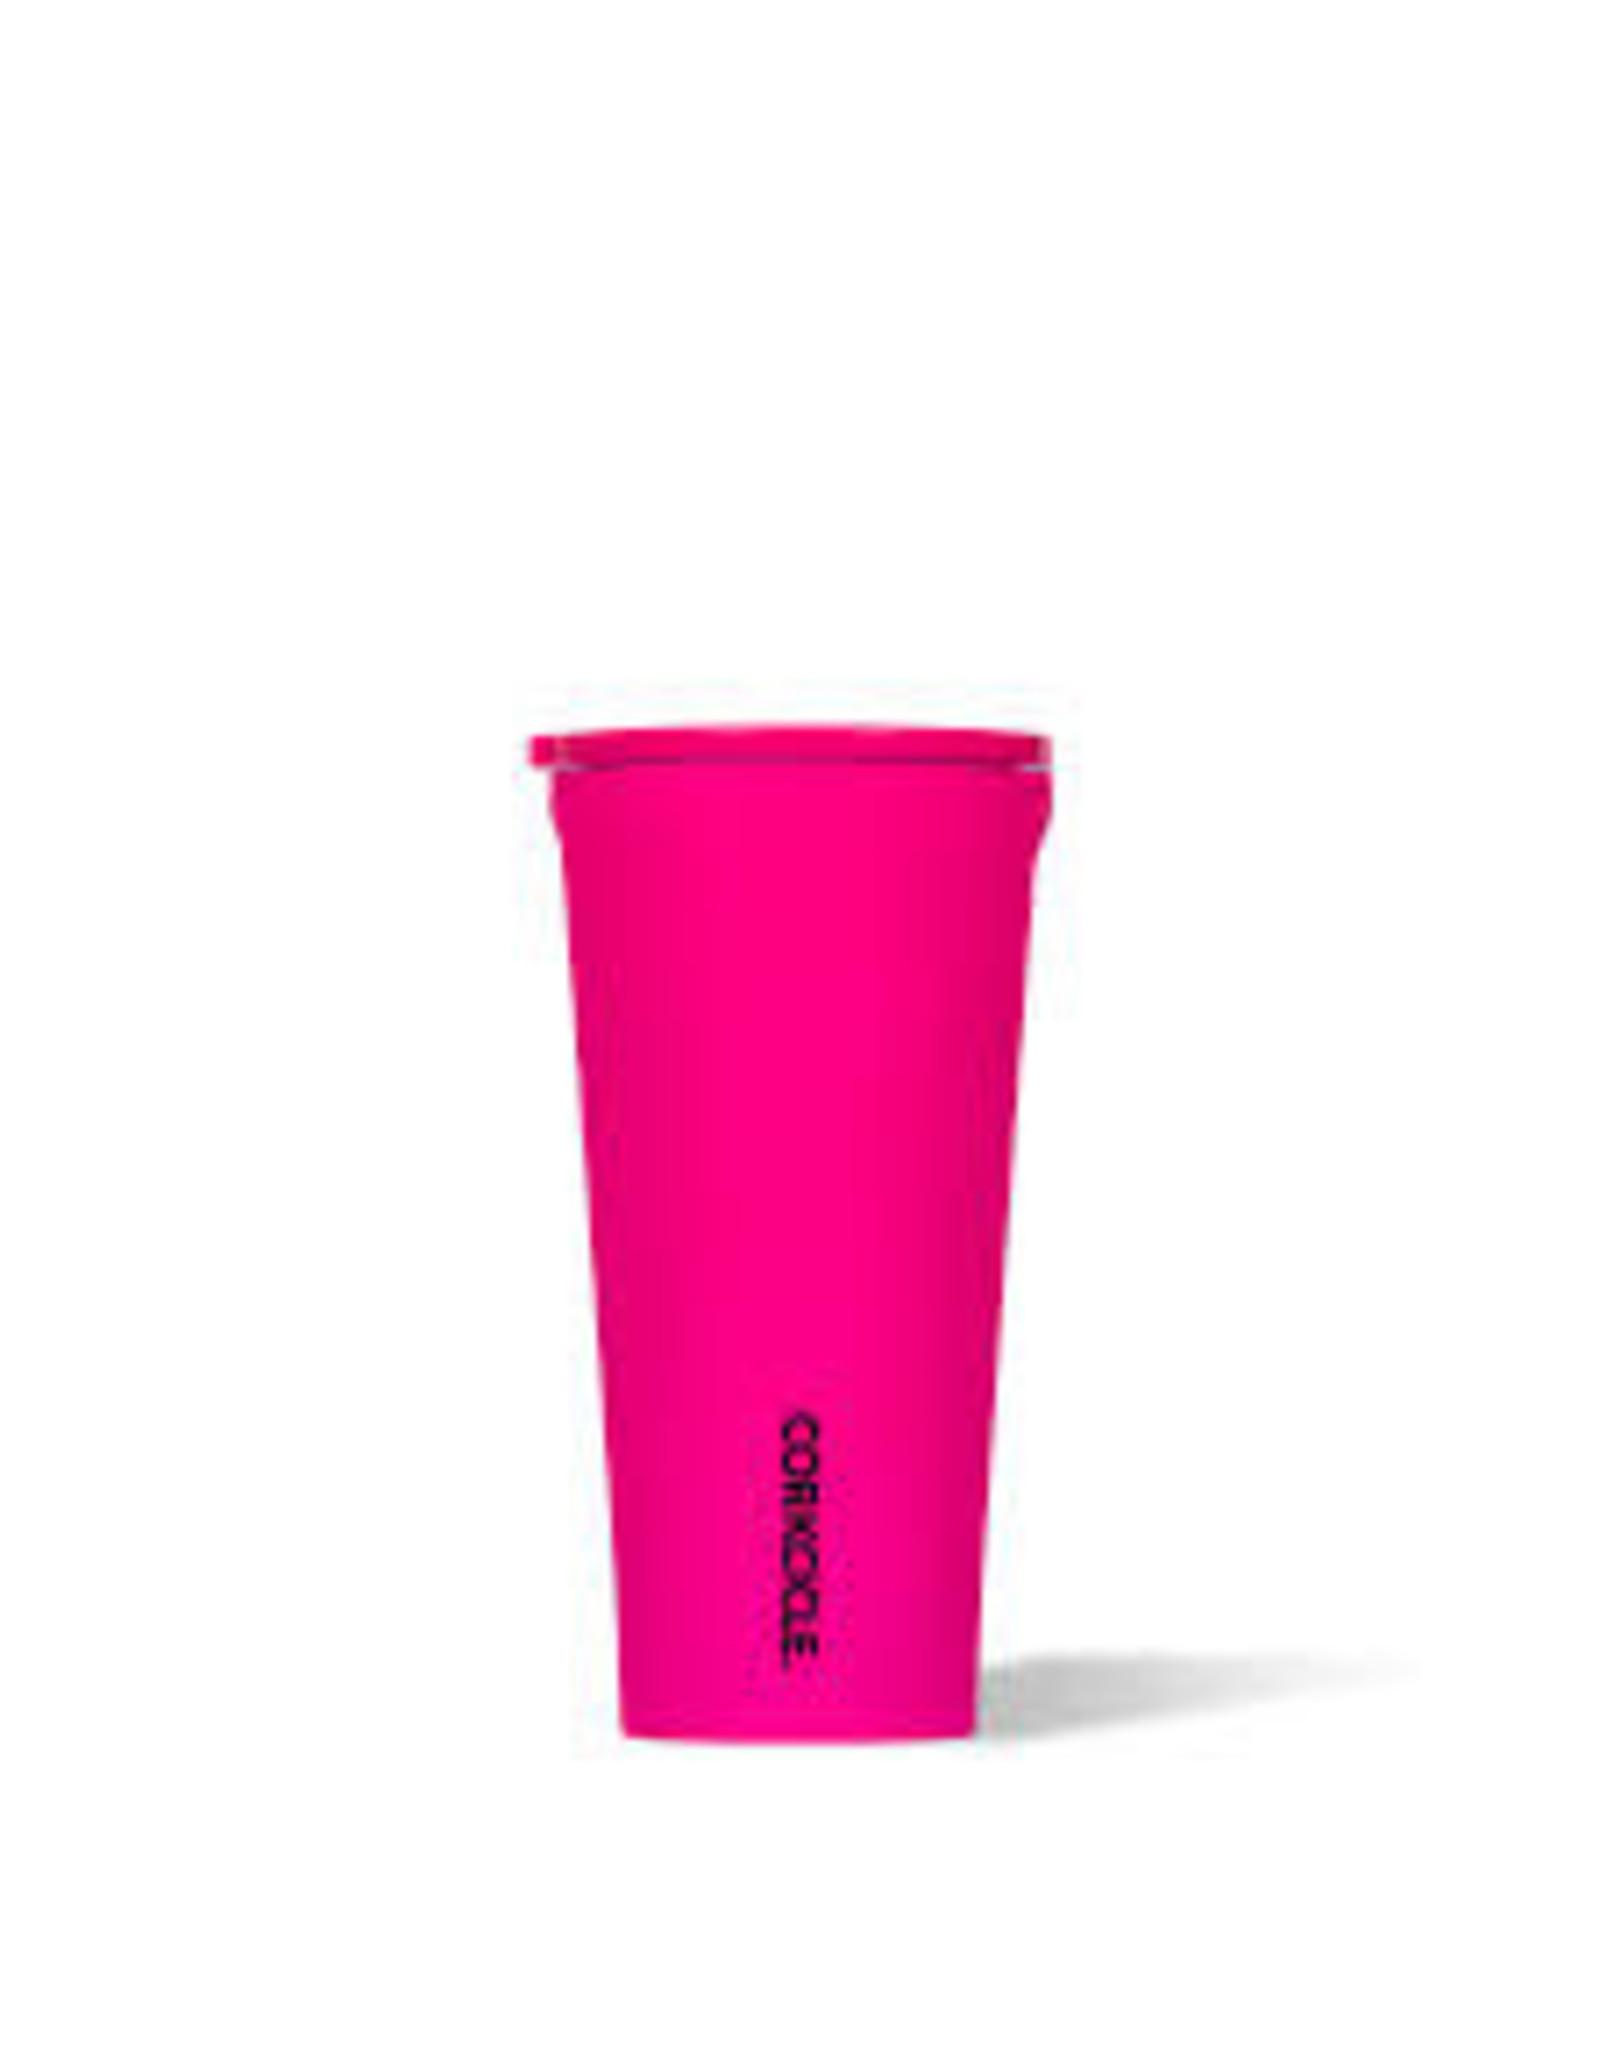 Corkcicle CORKCICLE-Tumbler - 16oz Neon Lights Neon Pink